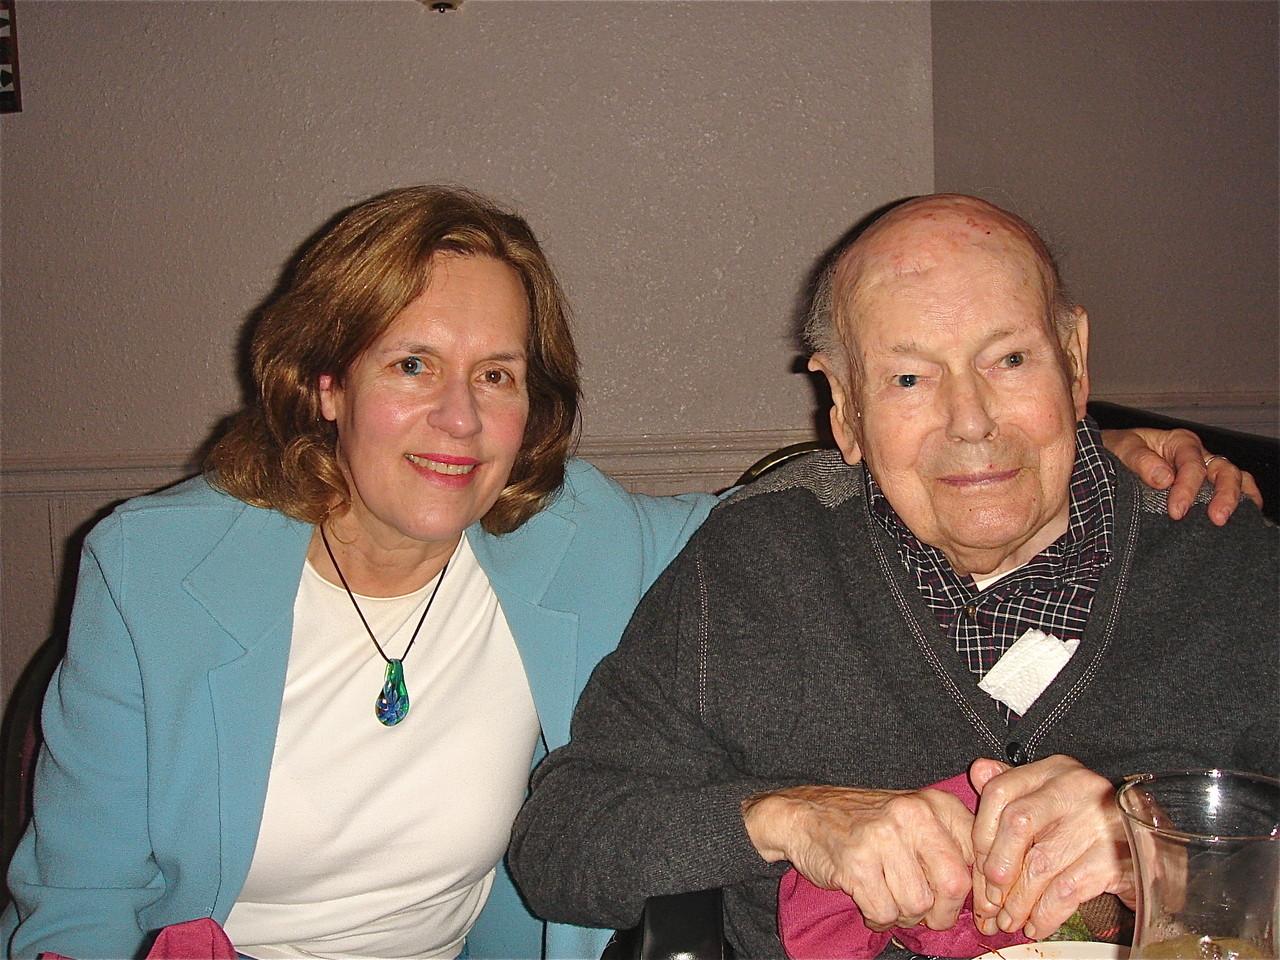 Lorraine & Al, Casa di Copani Restaurant, Syracuse, NY 11-23-12